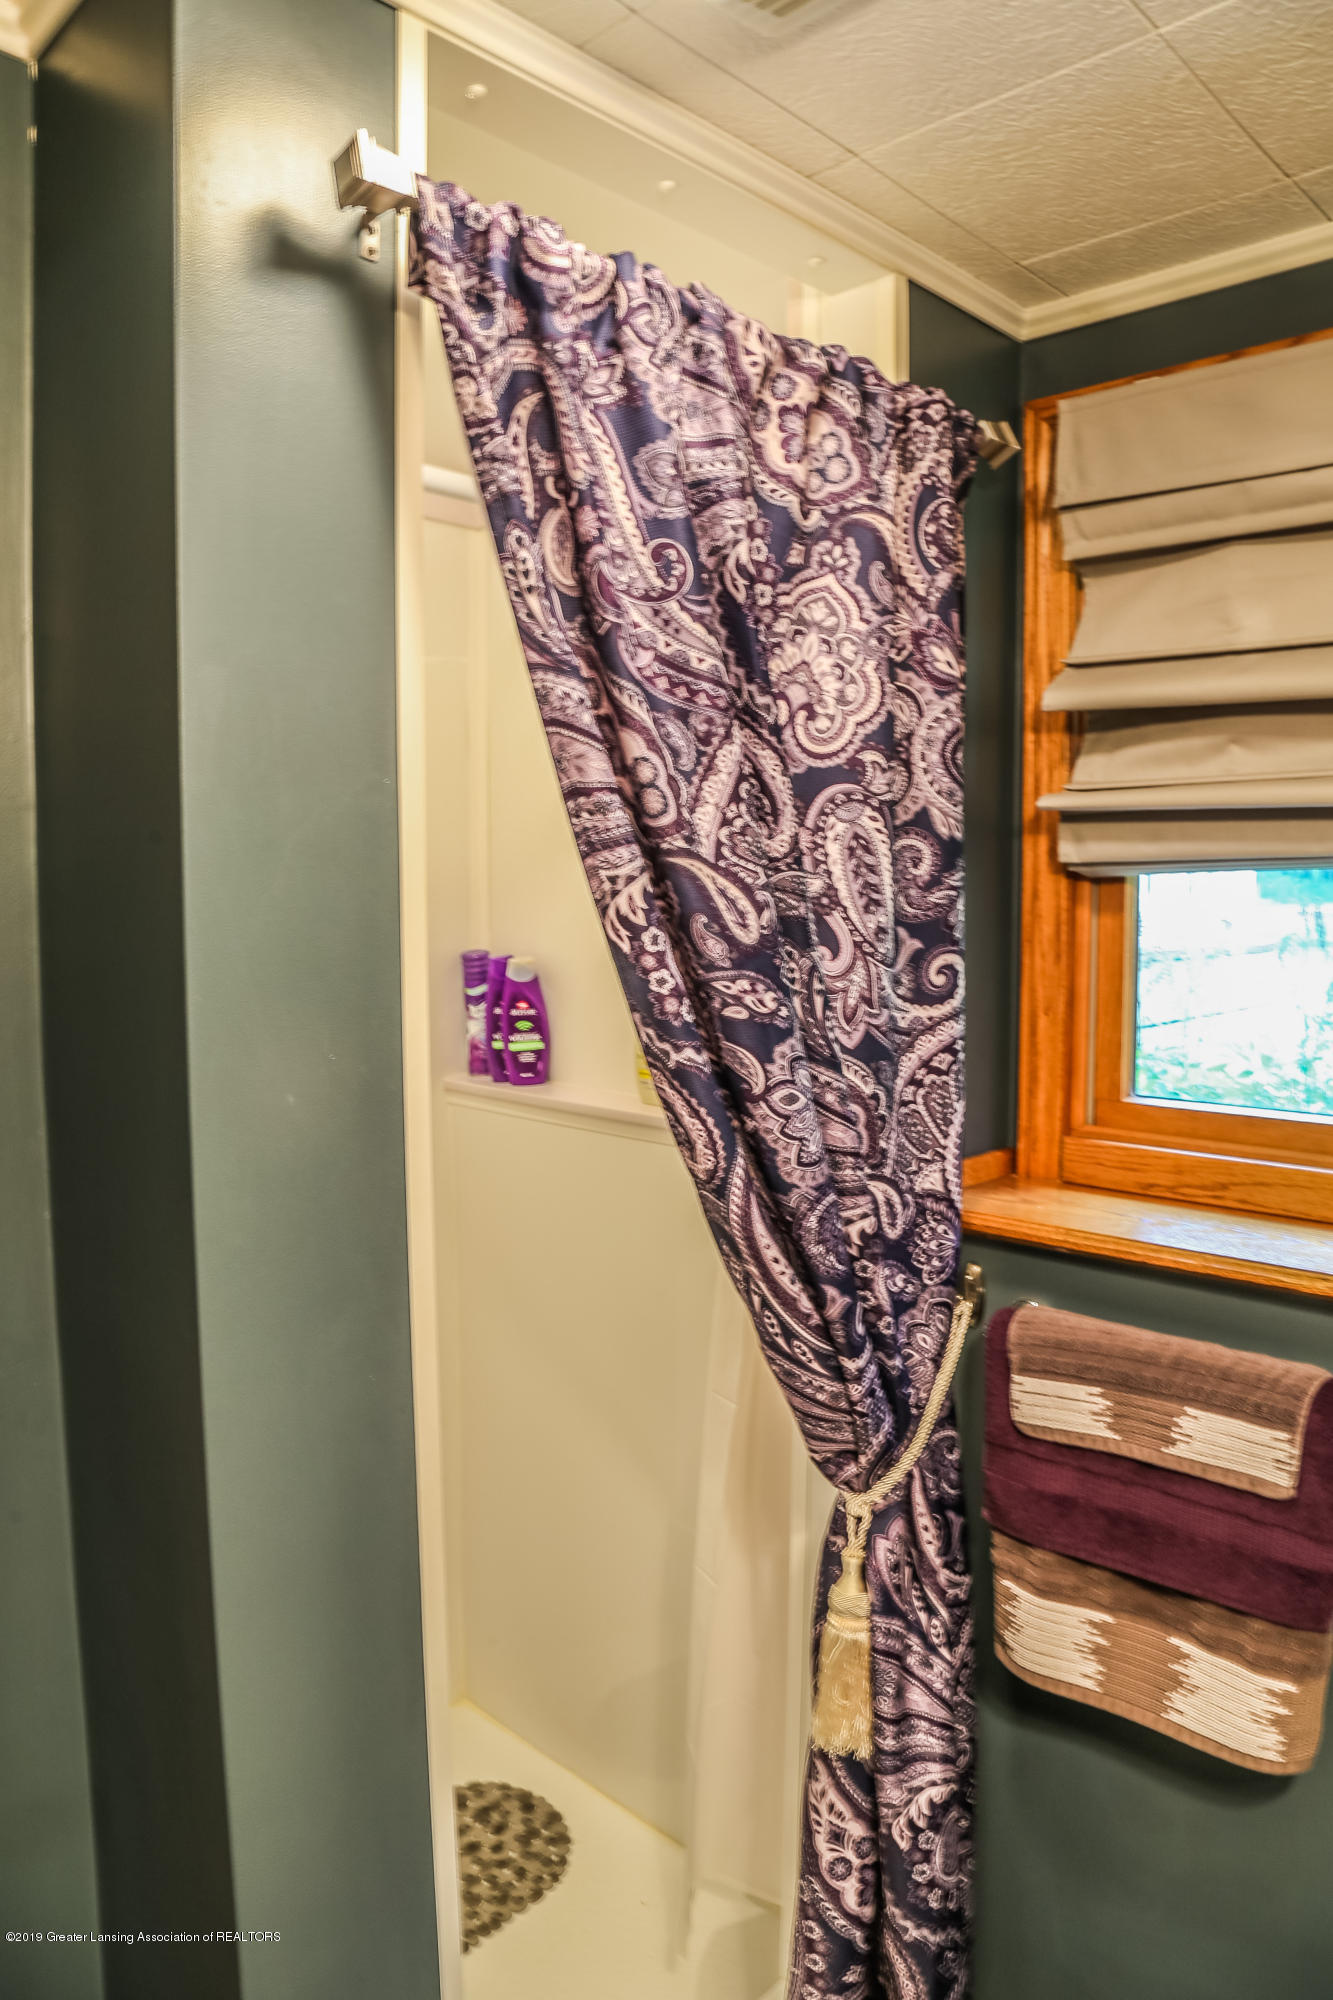 812 S Waverly Rd - Bathroom - 30